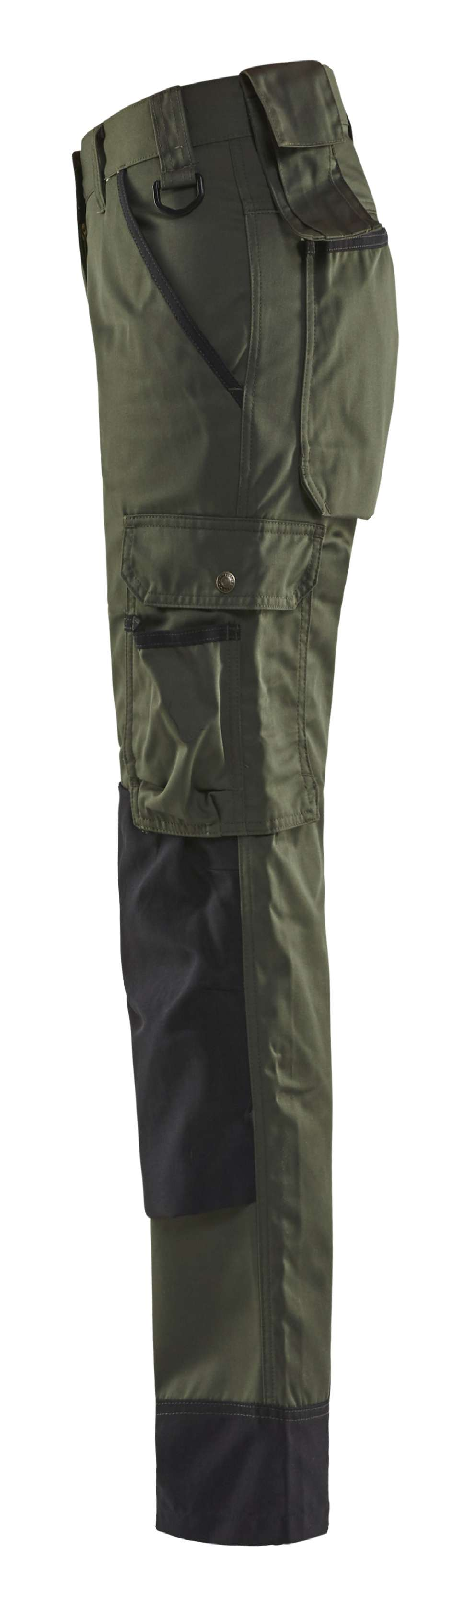 Blaklader Broeken 71541835 army groen-zwart(4699)